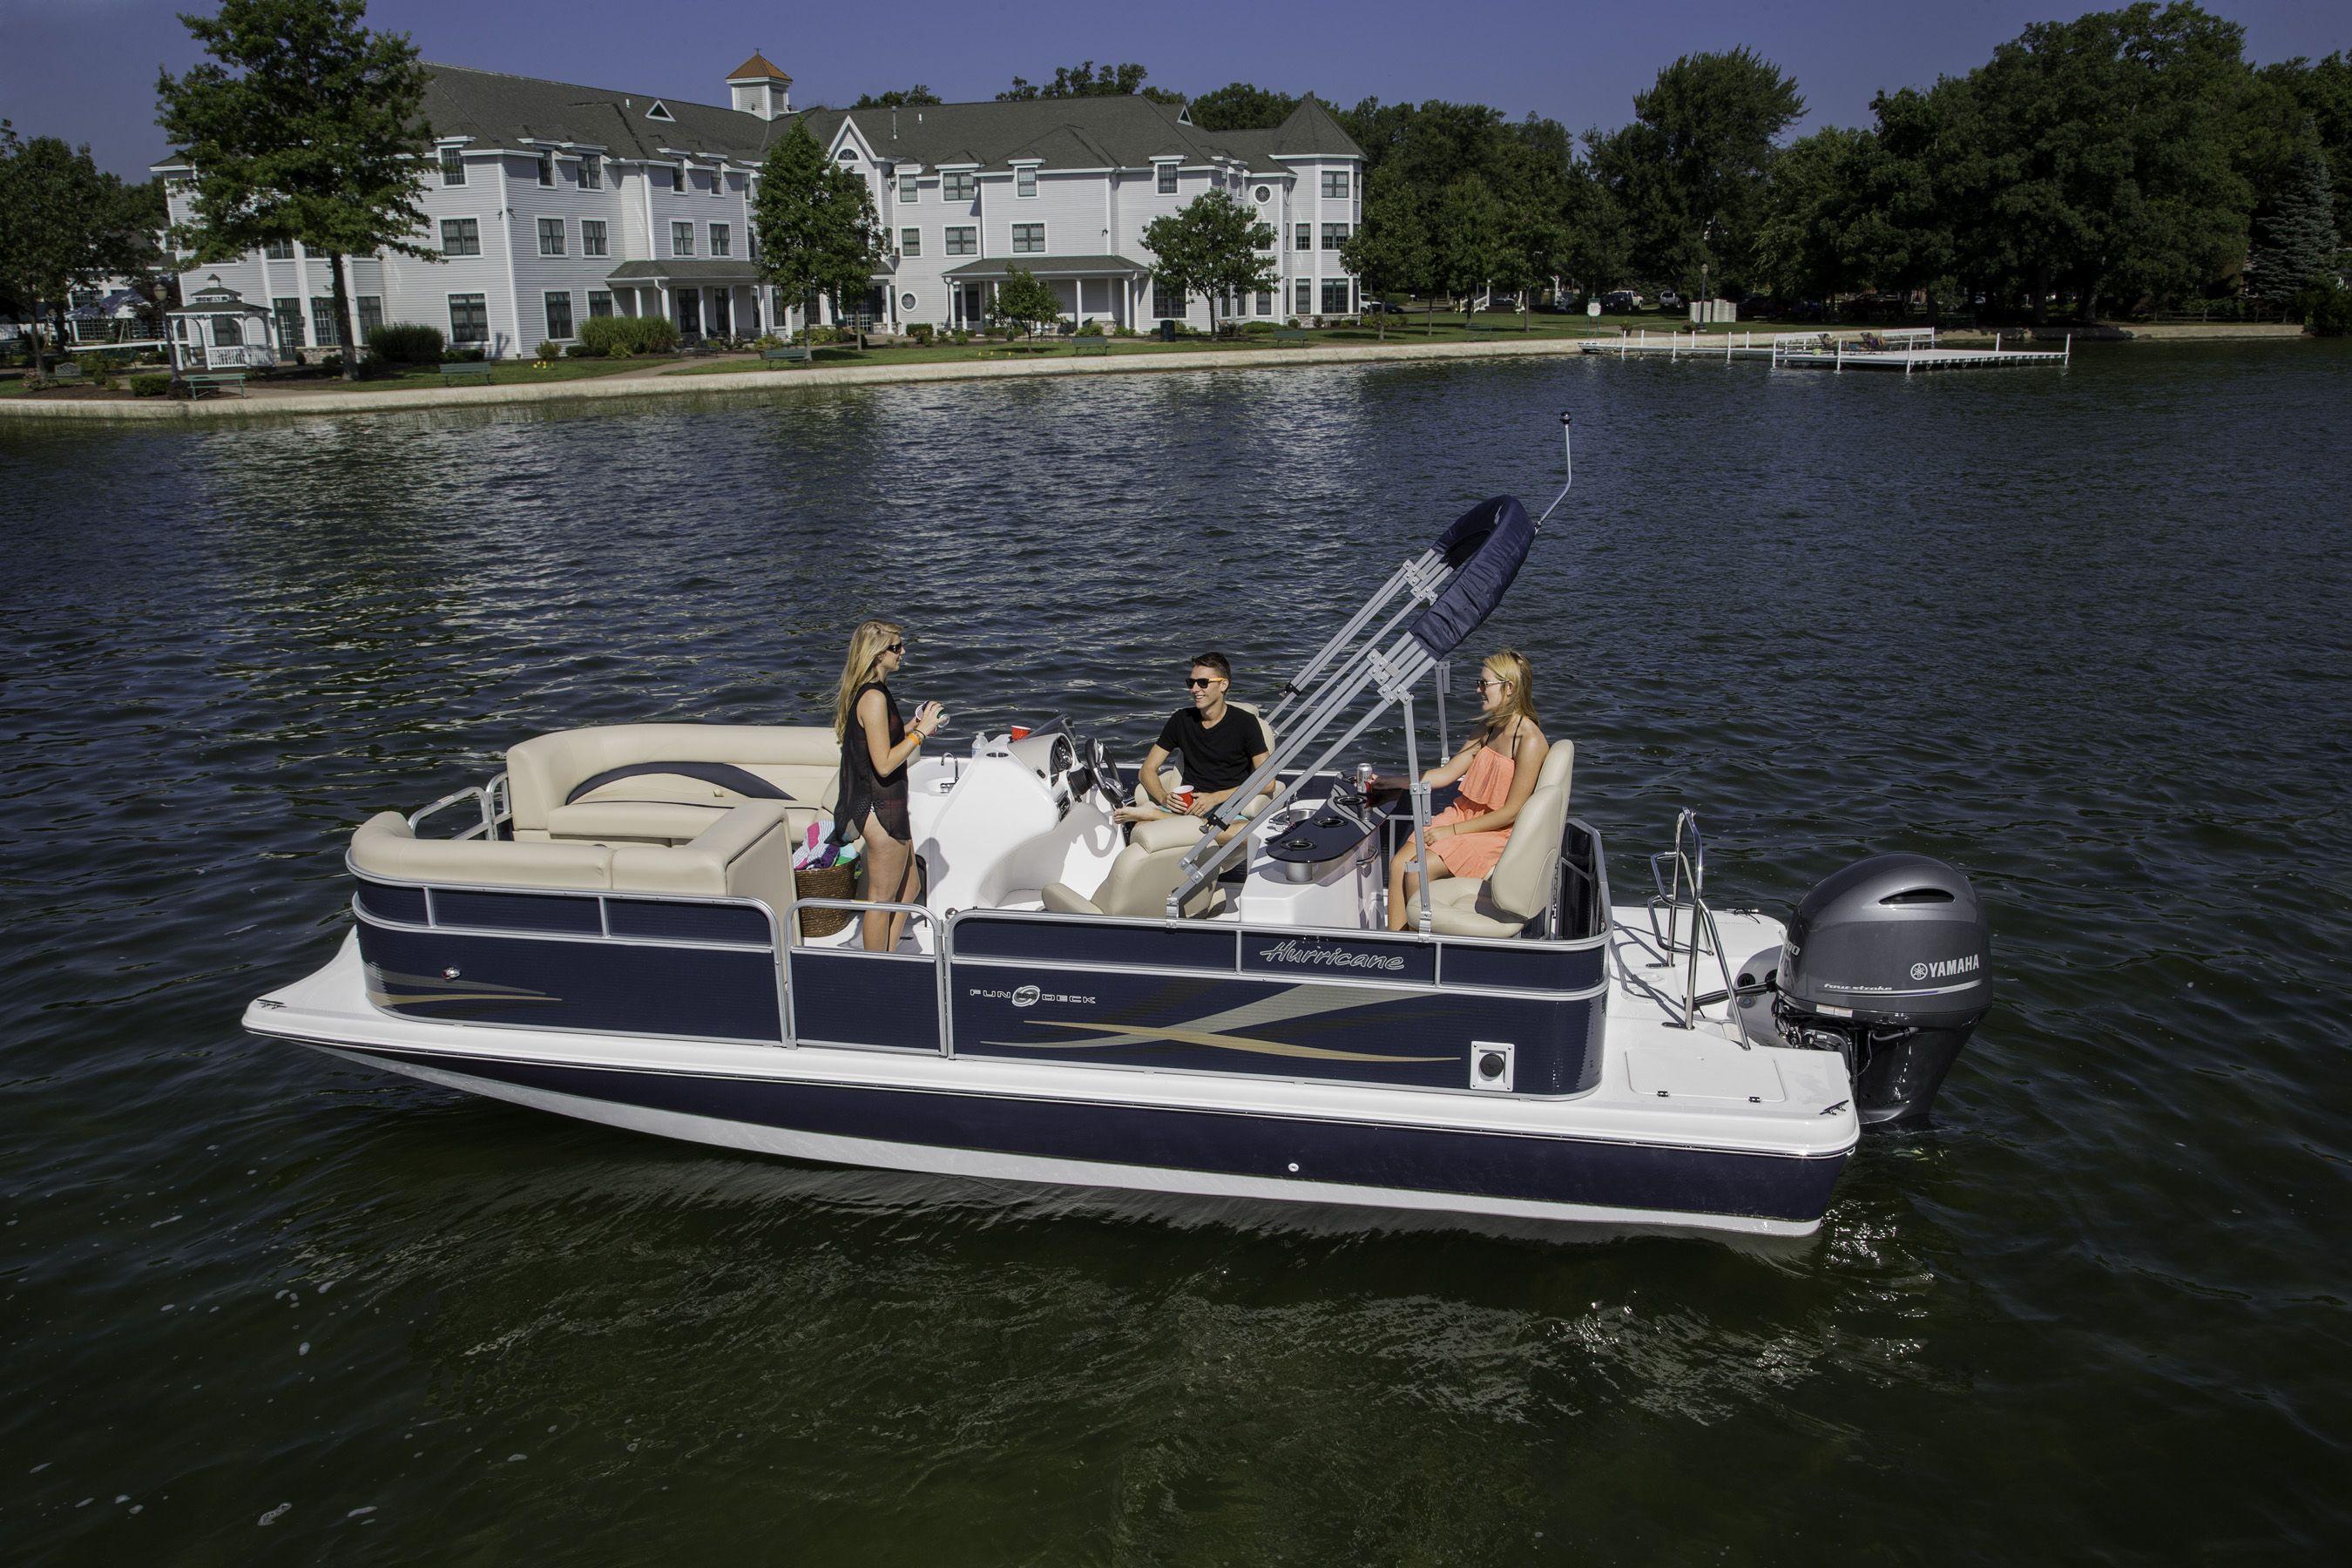 Pin By Hurricane Boats On Hurricane Fundeck Models Cool Boats Hurricane Boats Family Boats